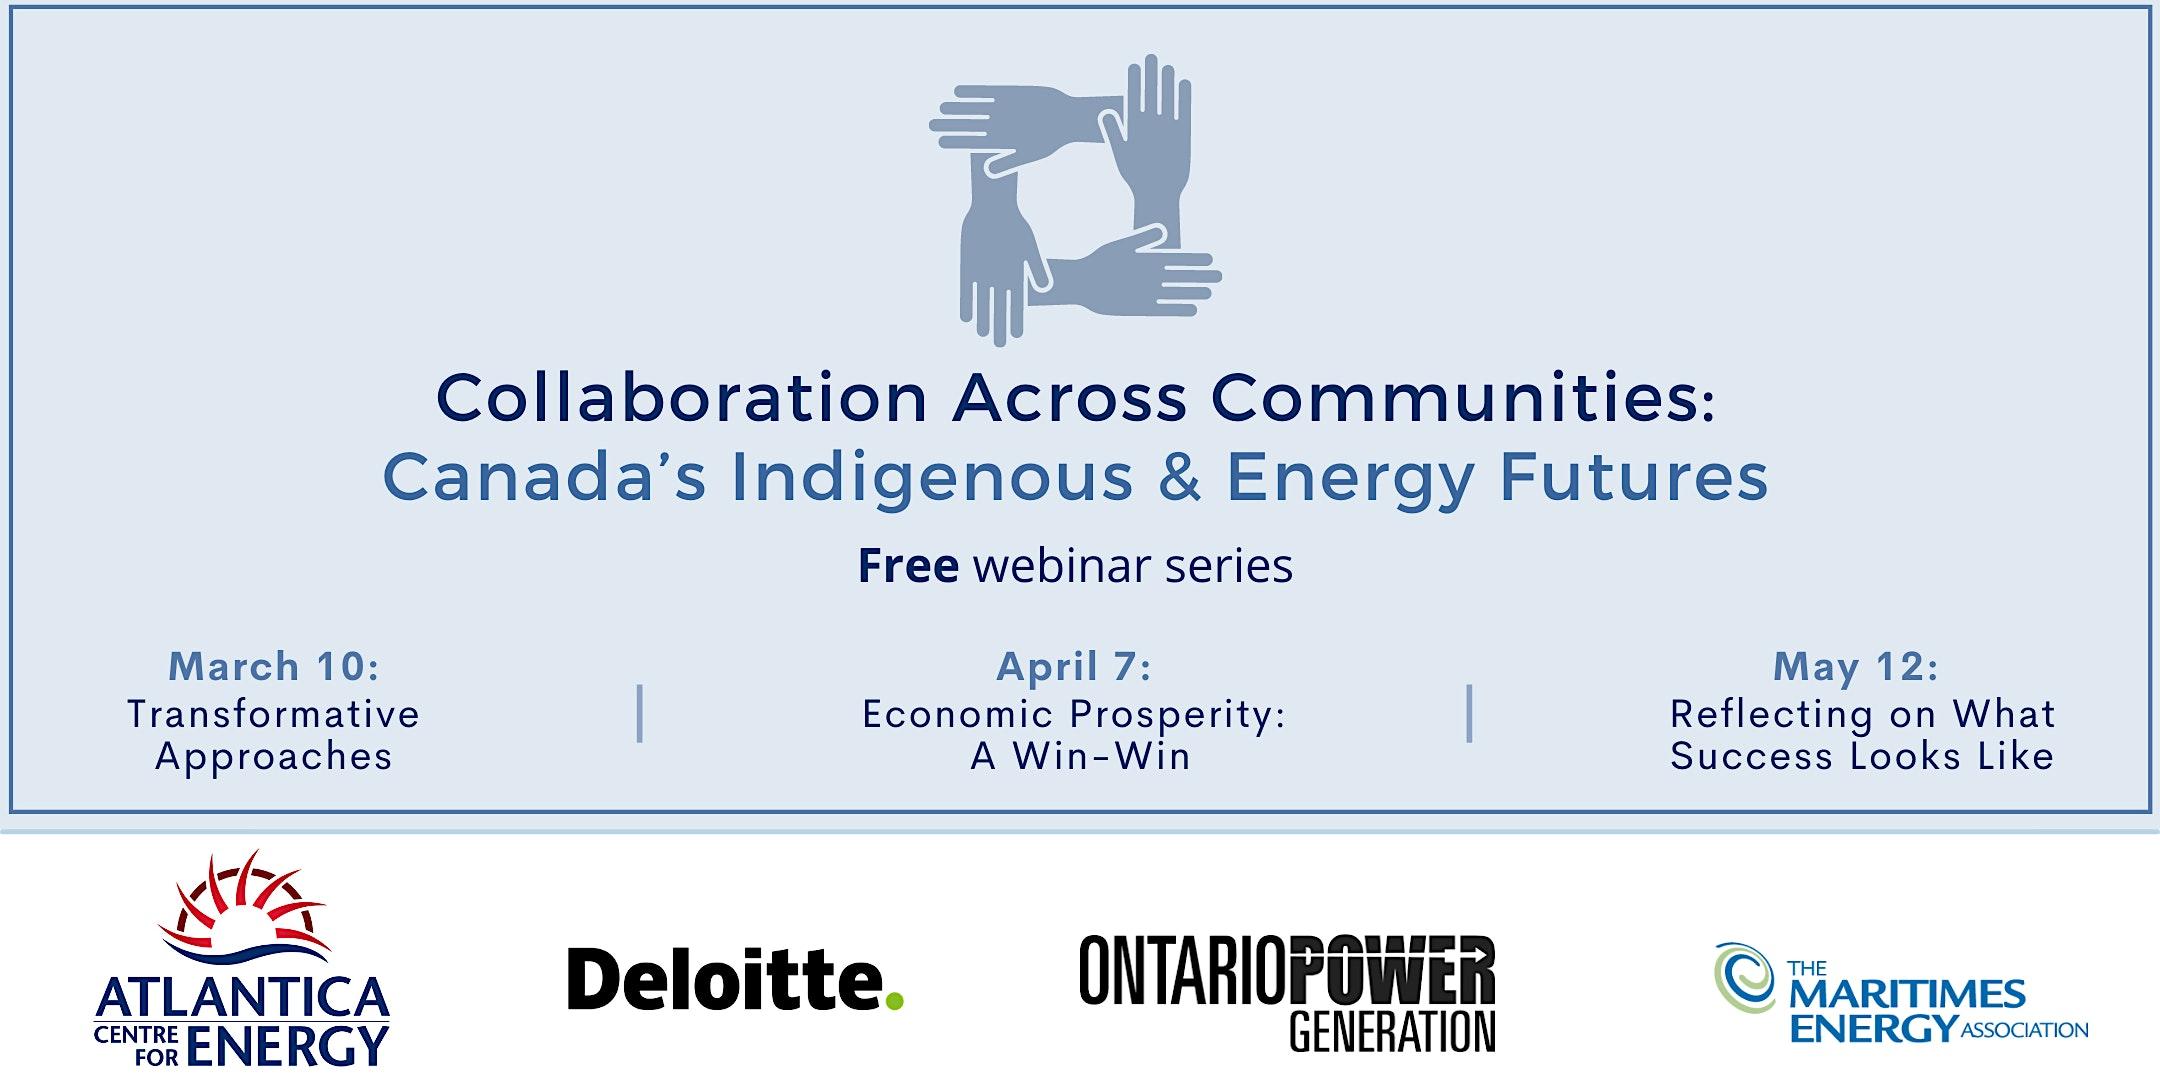 Collaboration Across Communities: Canada's Indigenous & Energy Futures